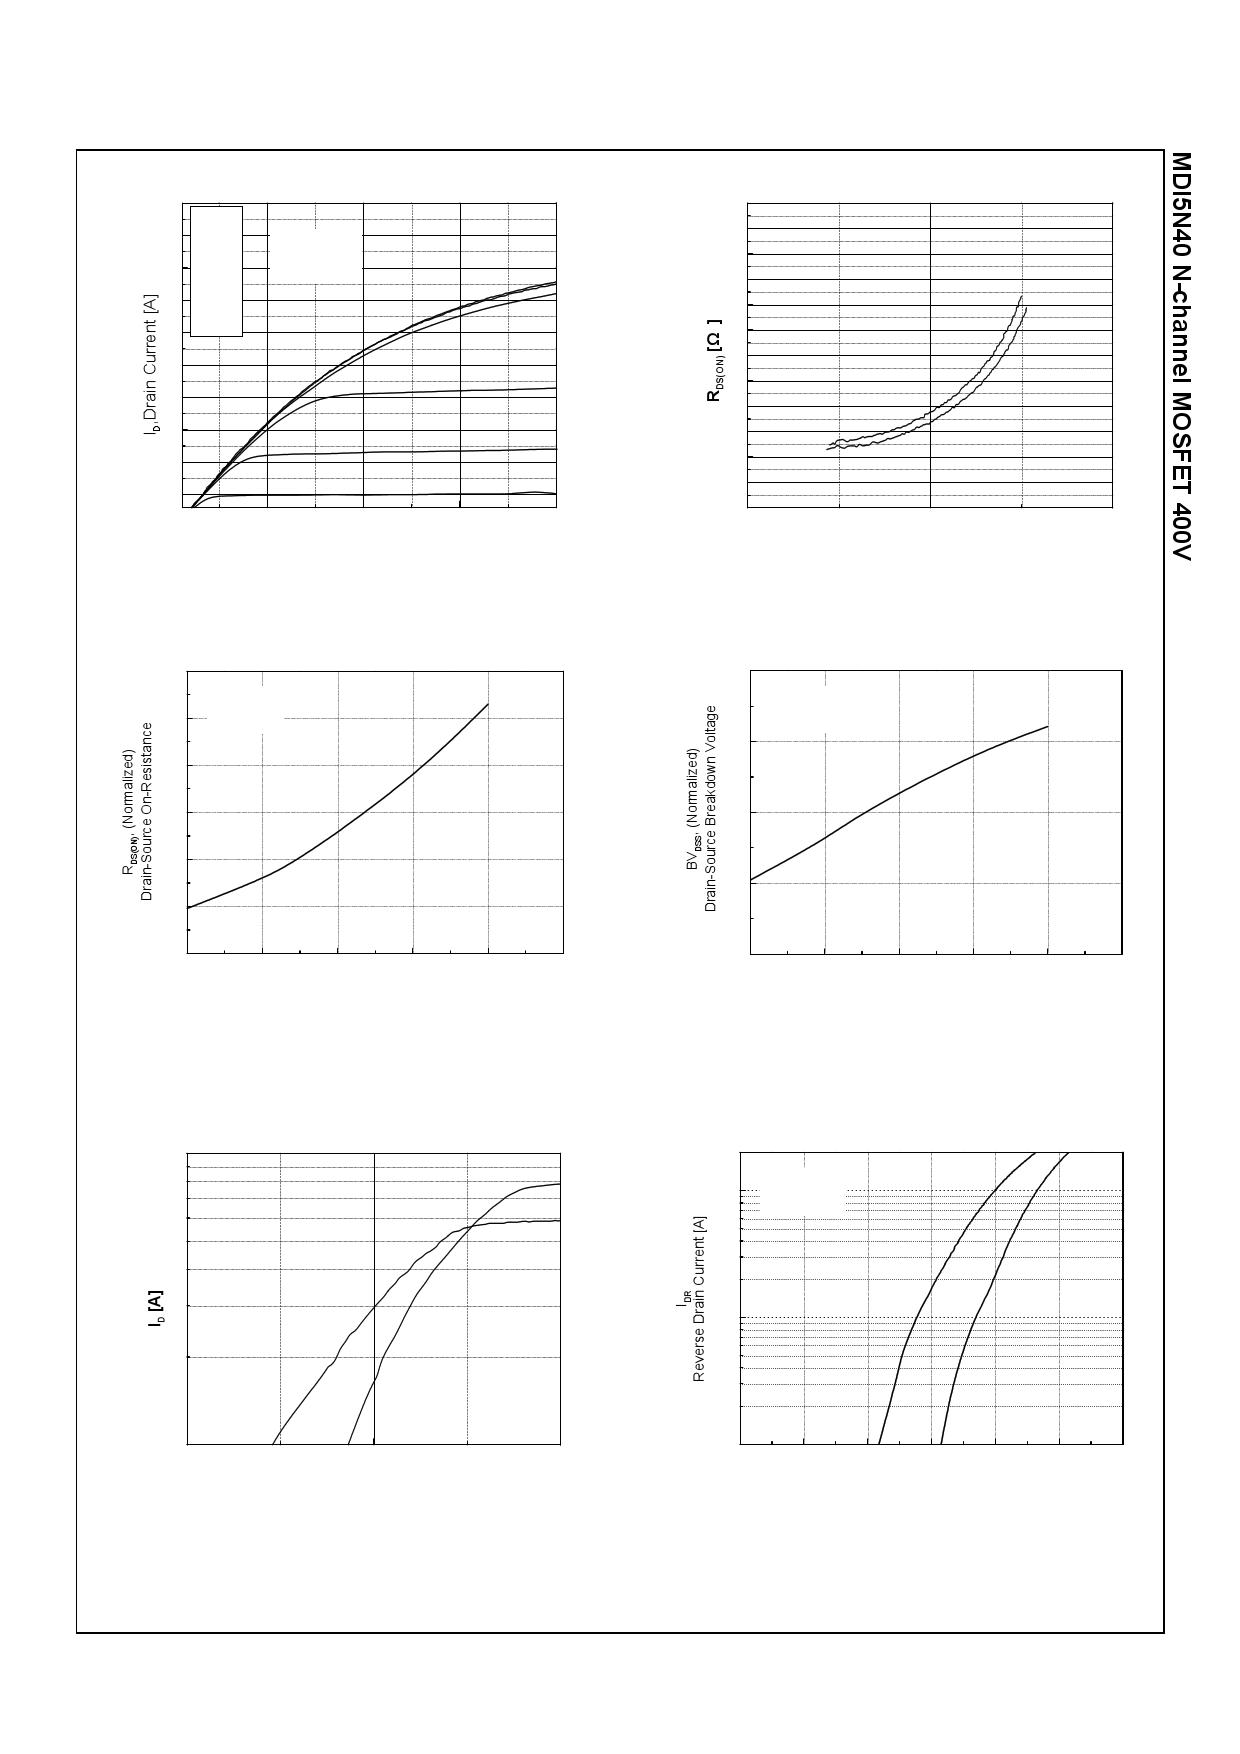 MDD5N40 pdf, ピン配列